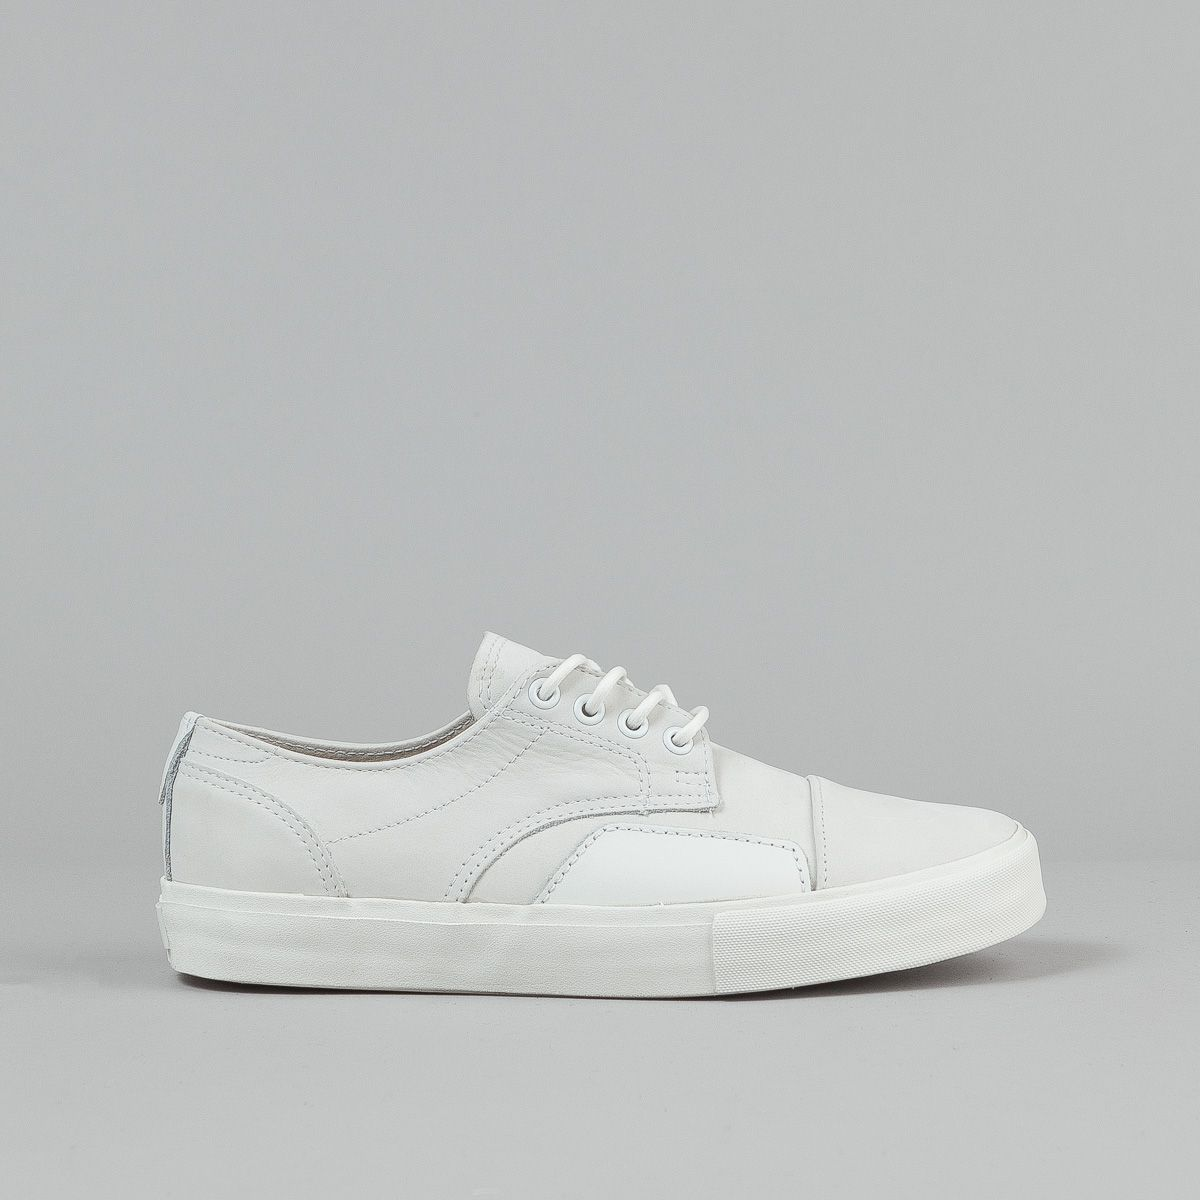 "8330b67436 029.170   Luke Meier  Style  Seylynn ""S"" in white by Vans  Syndicate  collection."